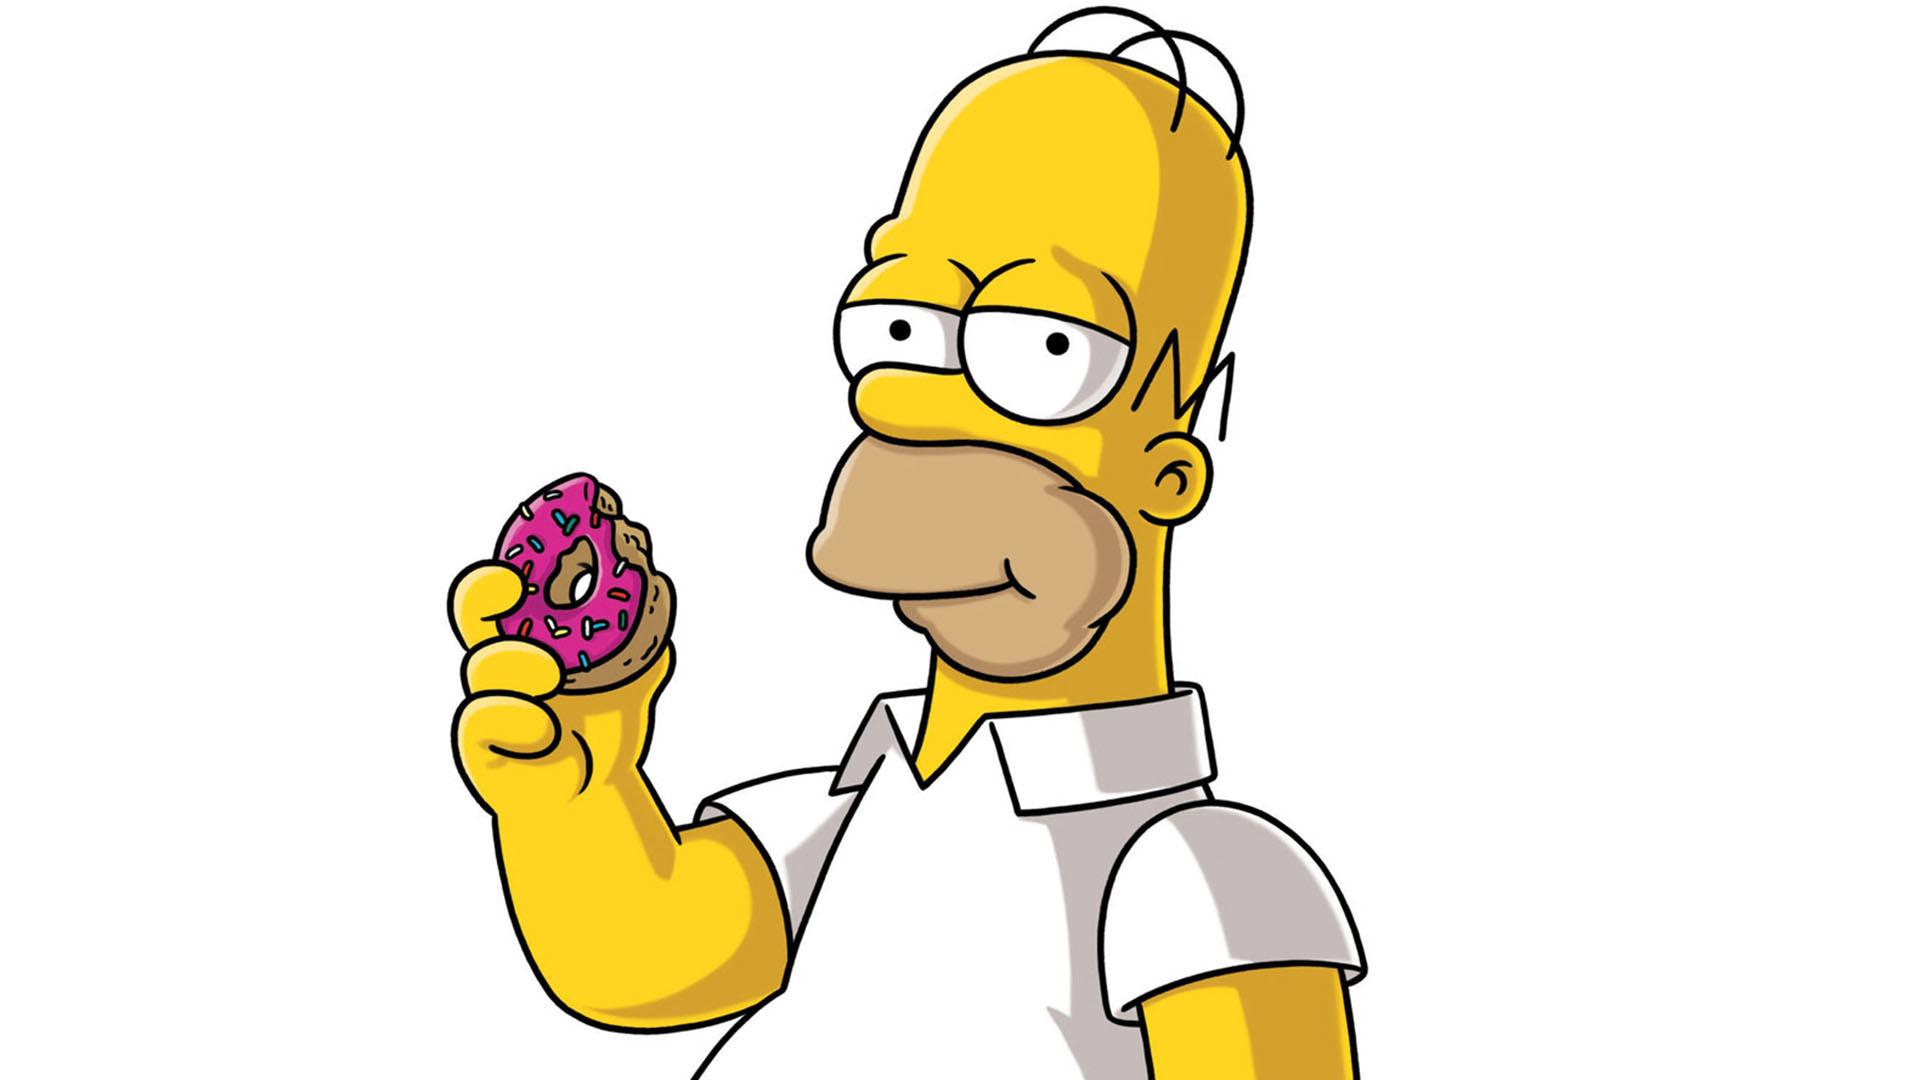 Homer Simpson Clipart at GetDrawings.com.